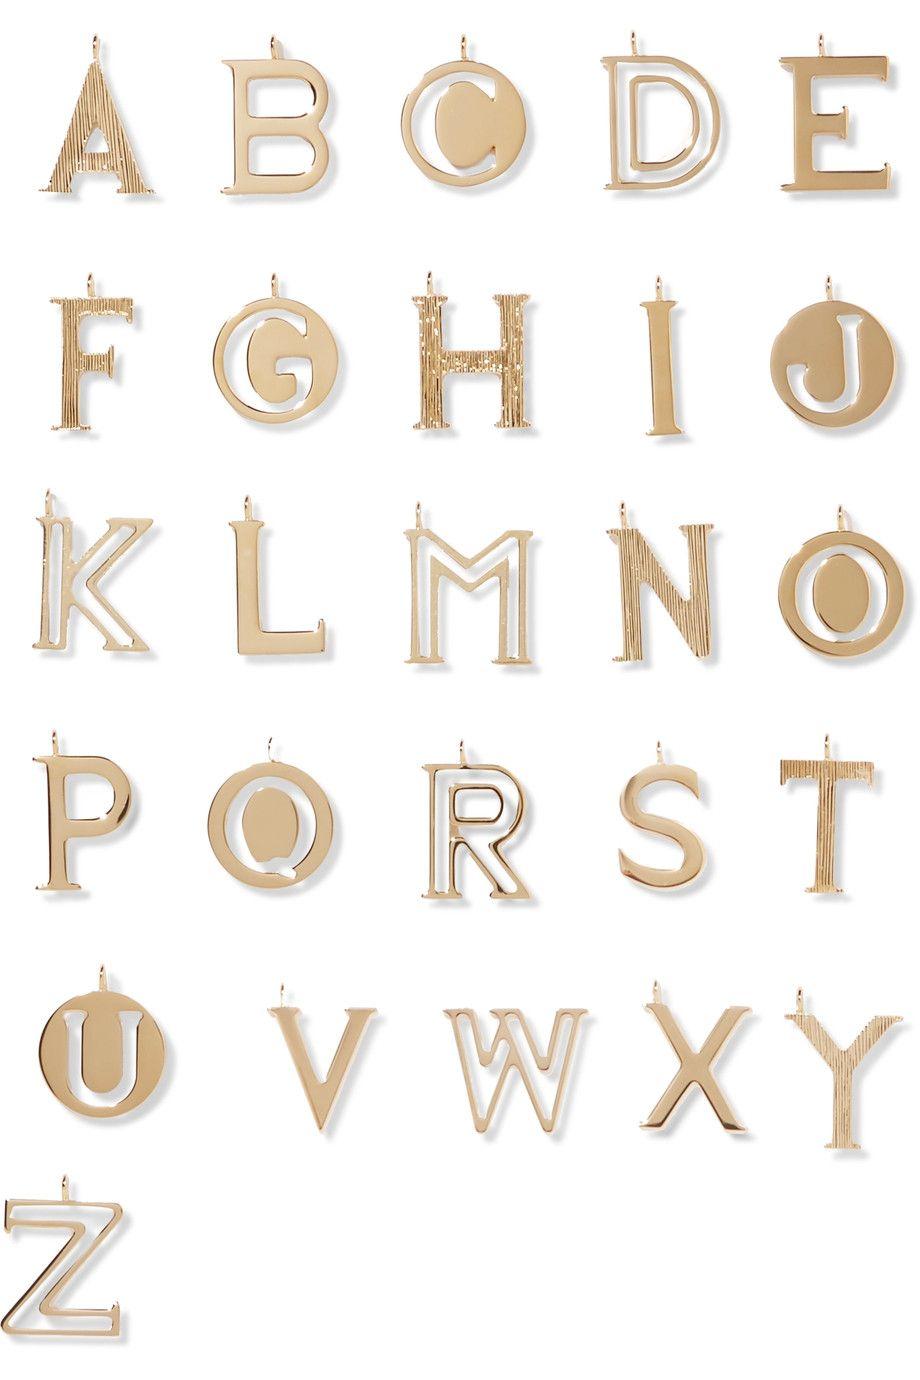 hbz-chloe-charms-1509043813.jpg (920×1380)